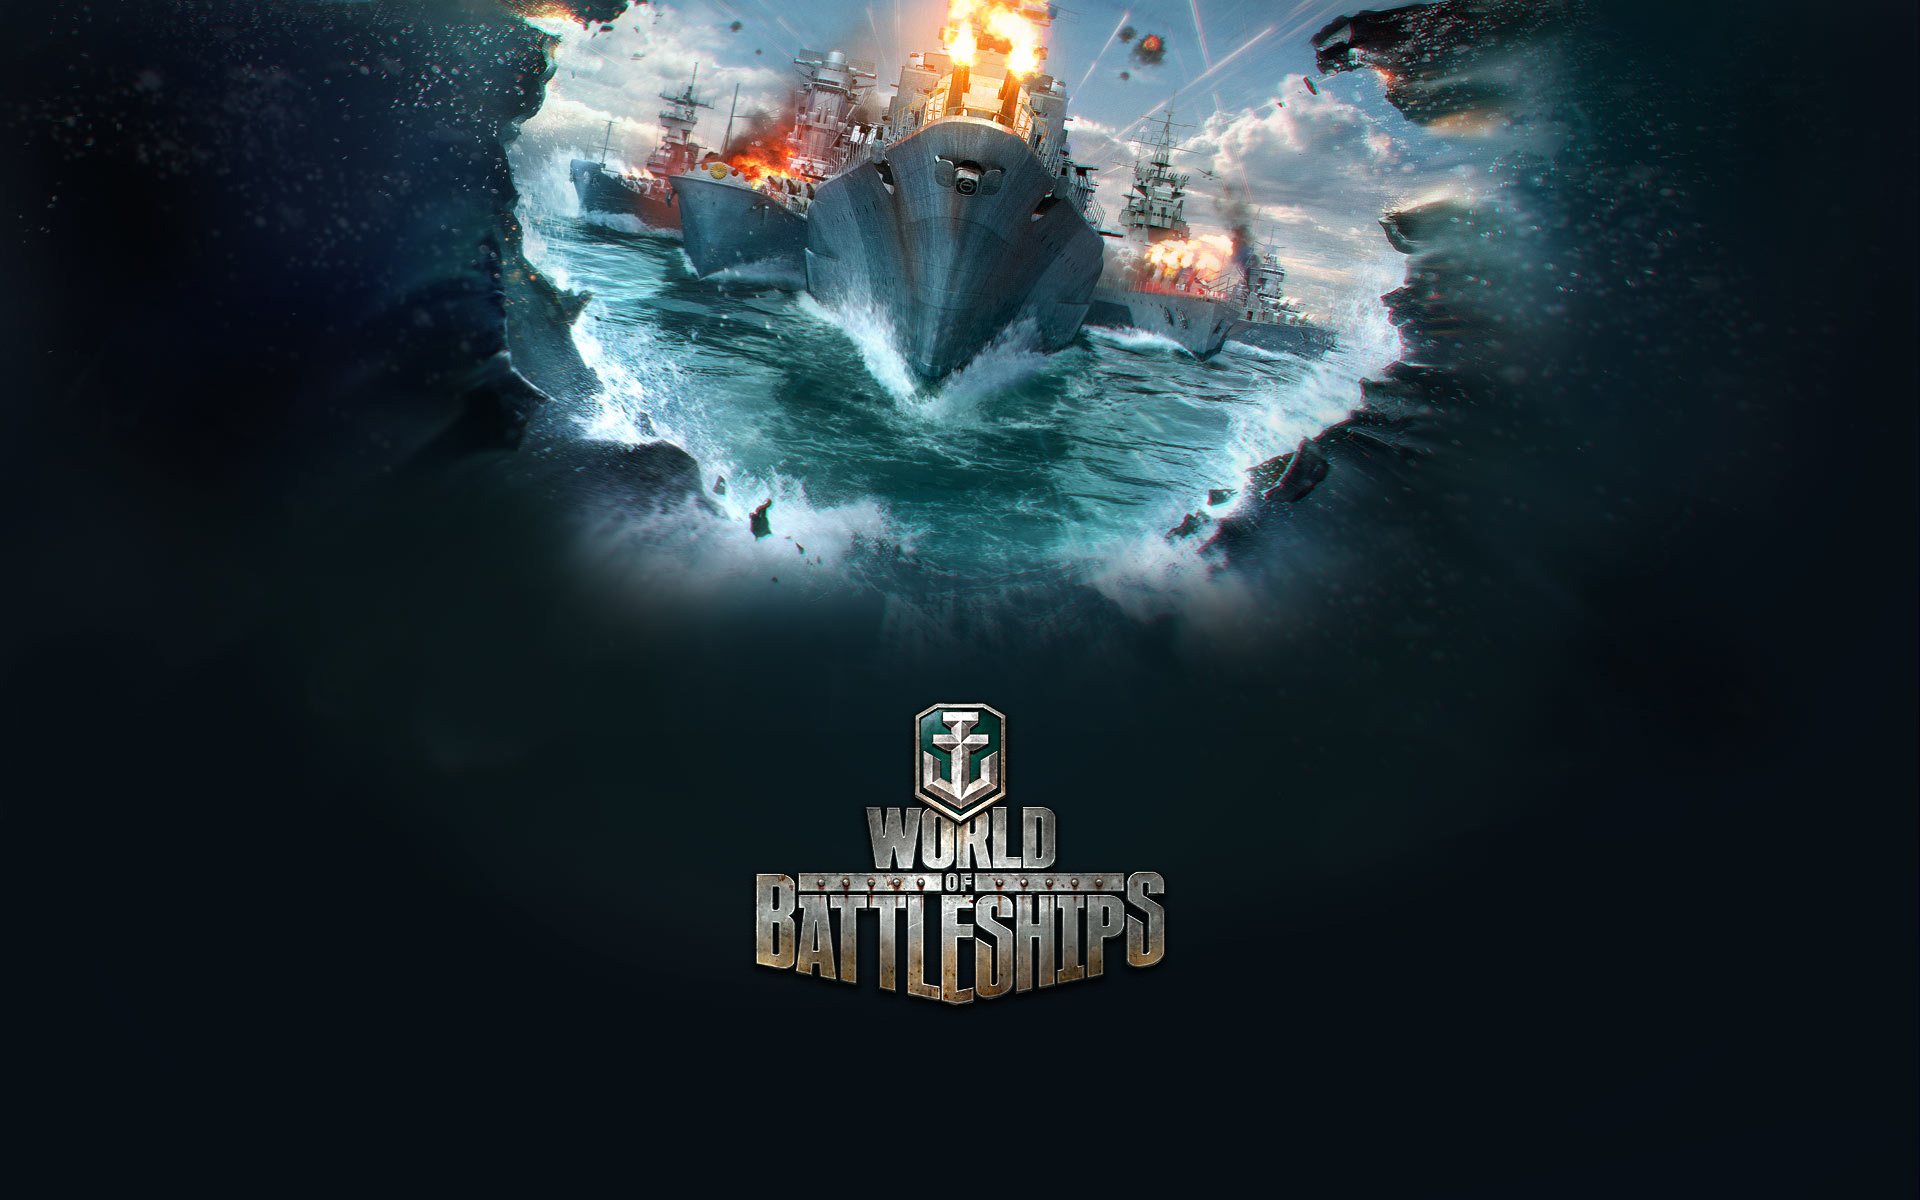 Battleships 4k Wallpapers For Your Desktop Or Mobile Screen Free